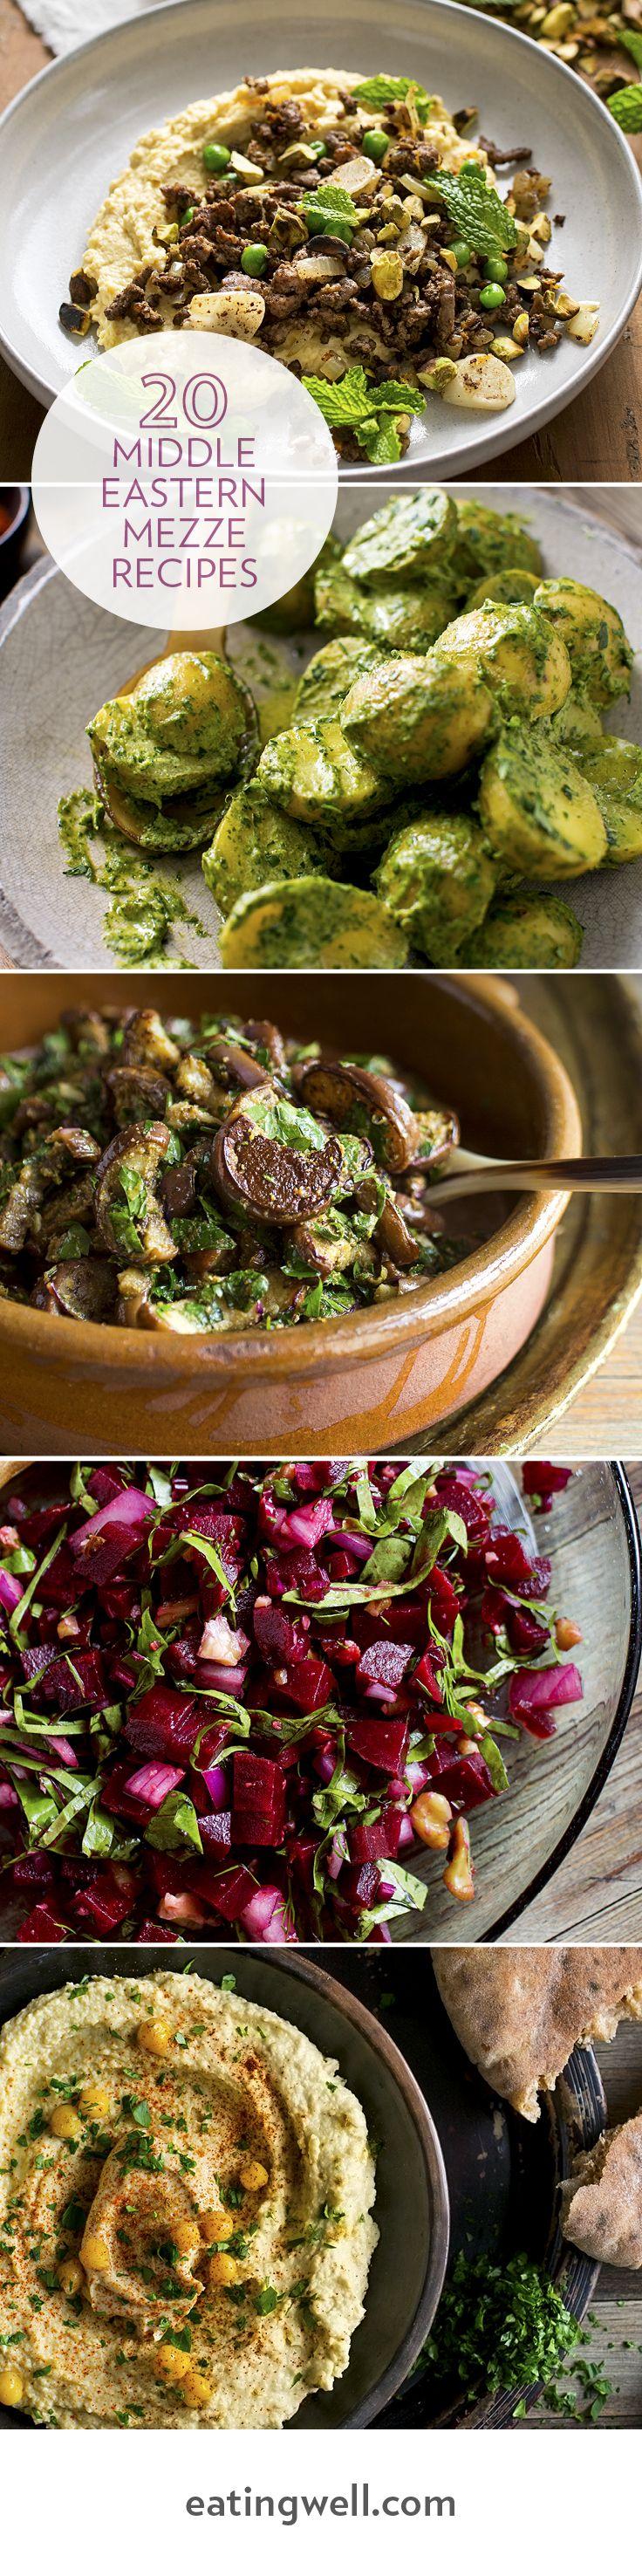 Amazing hummus, green potato salad, marinated eggplant, roasted cauliflower, lamb and more!